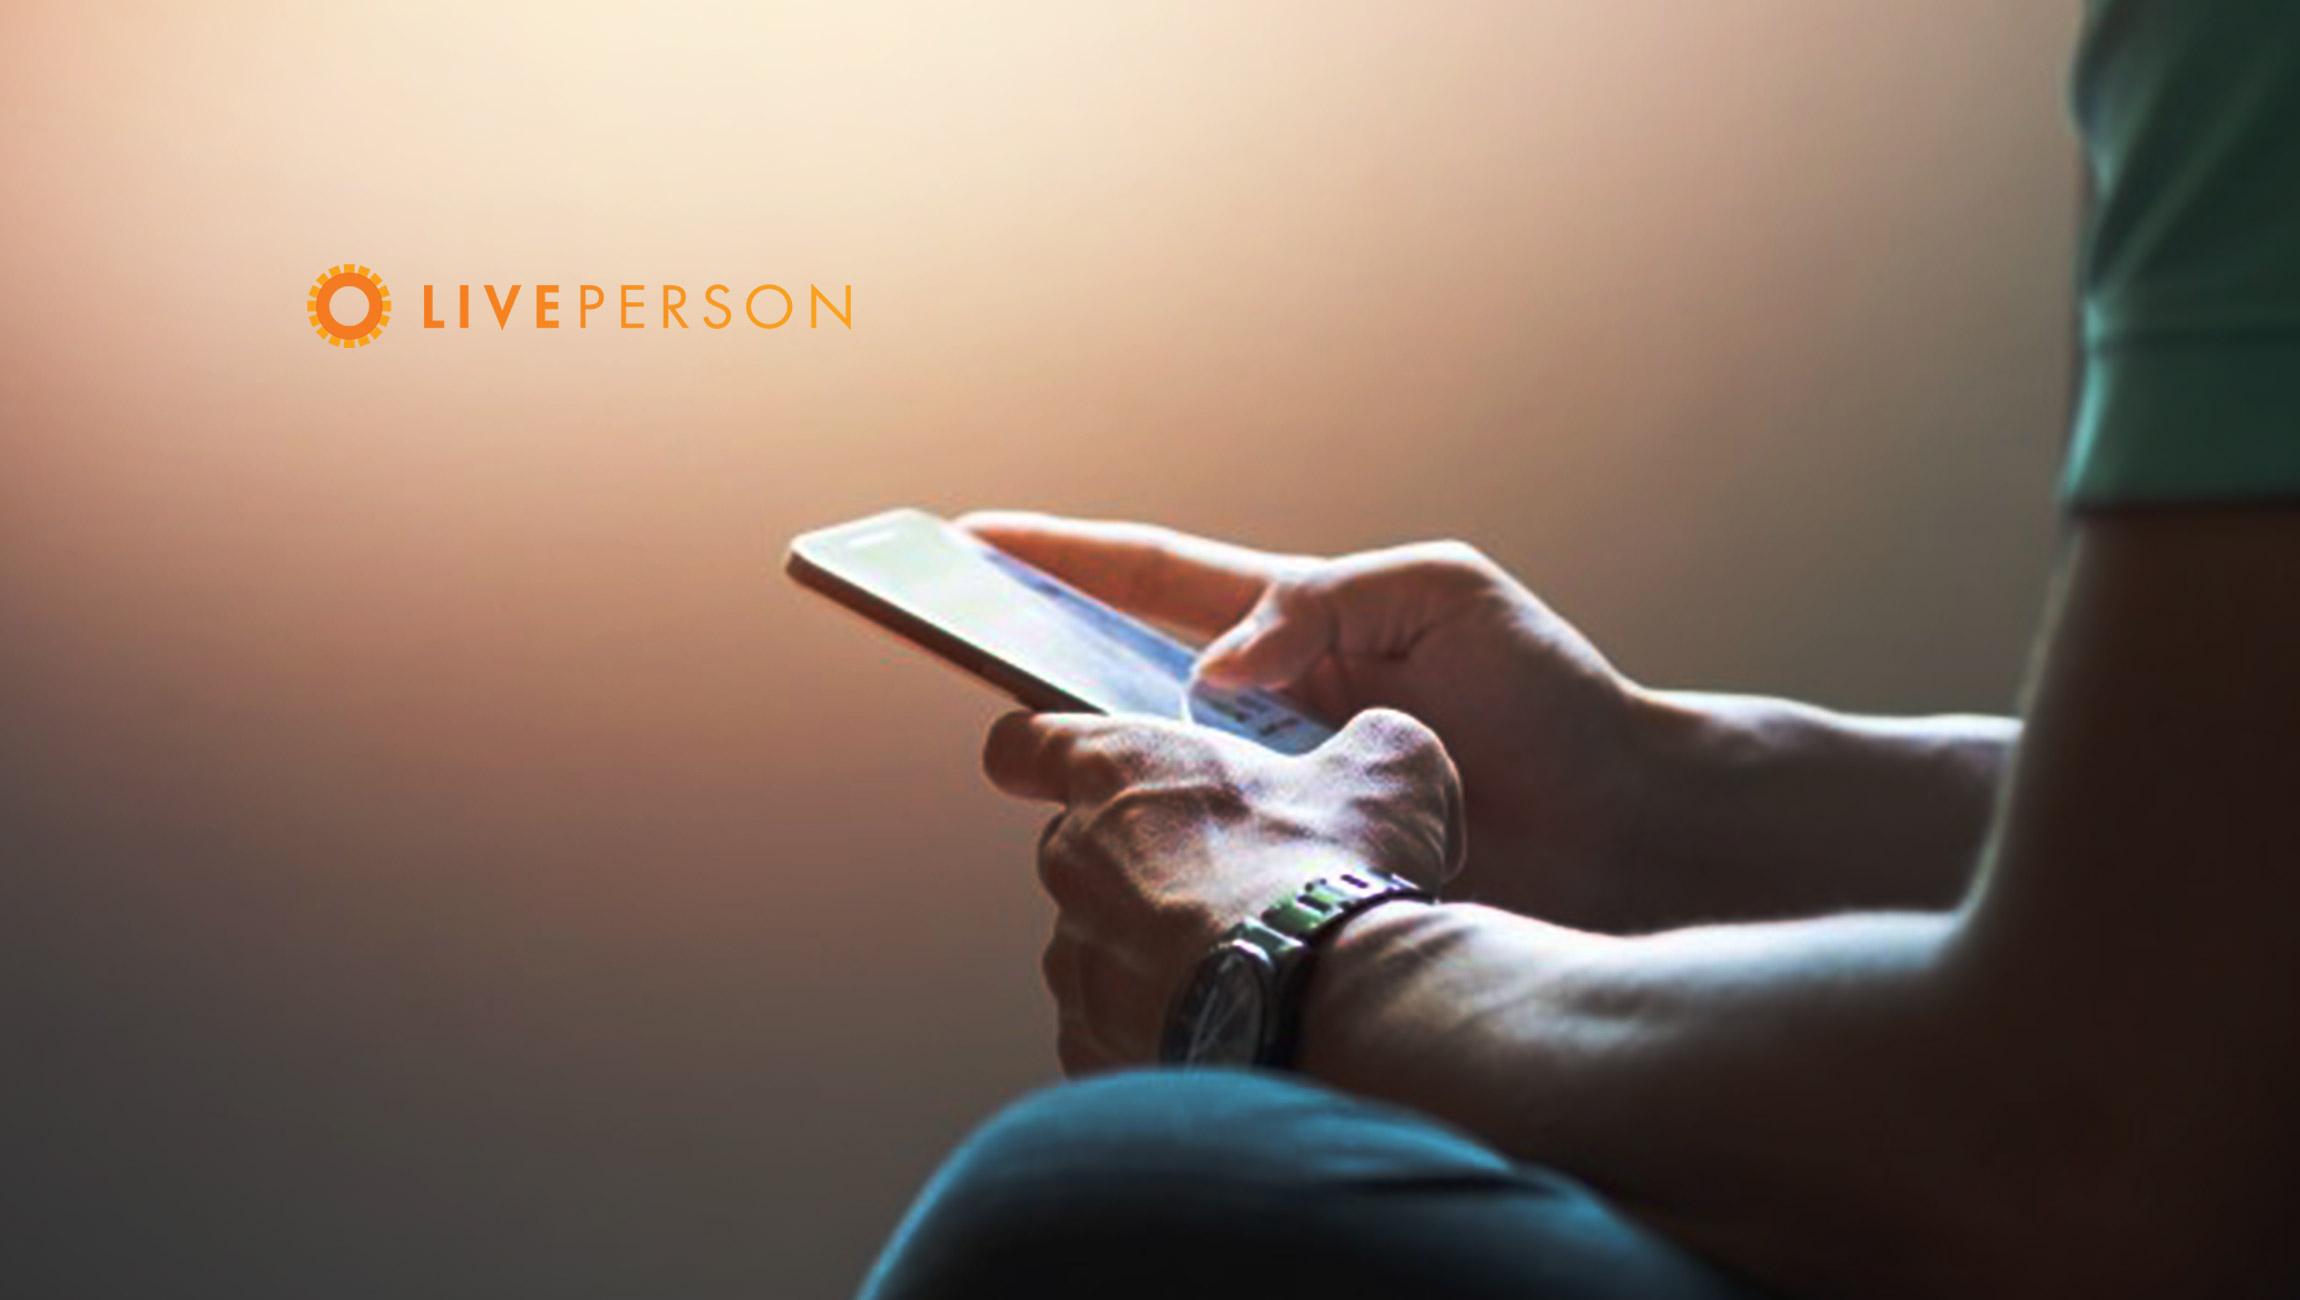 LivePerson Integration Makes SAP Upscale Commerce Solution Conversational